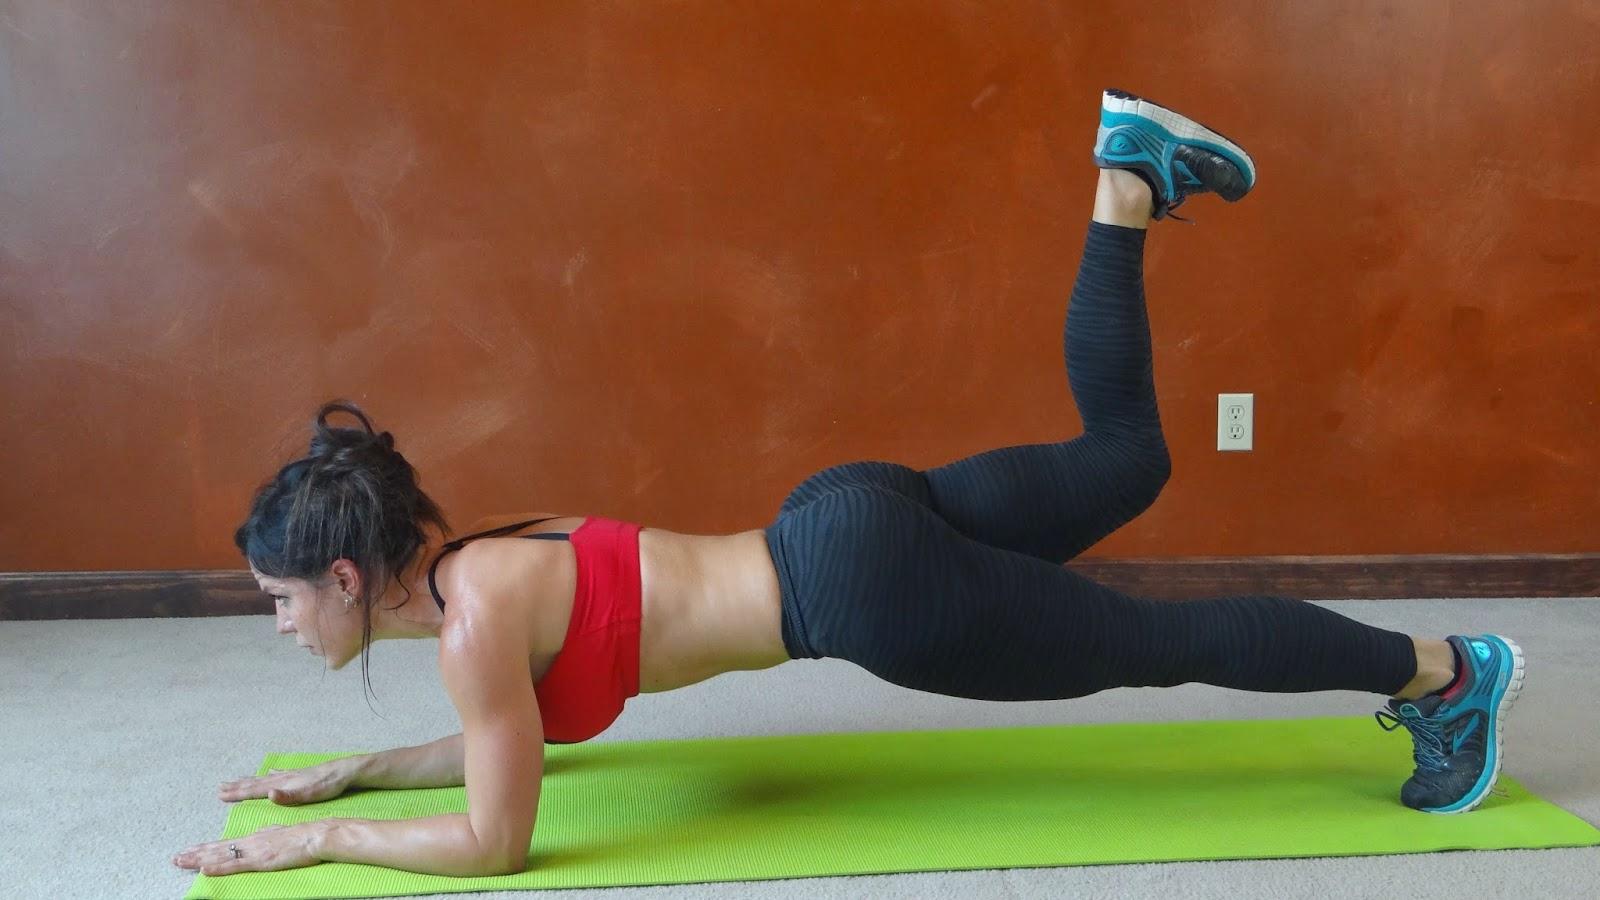 Melissa Bender Fitness: 20 Minute Plank, Push-up & Burn: Workout ...